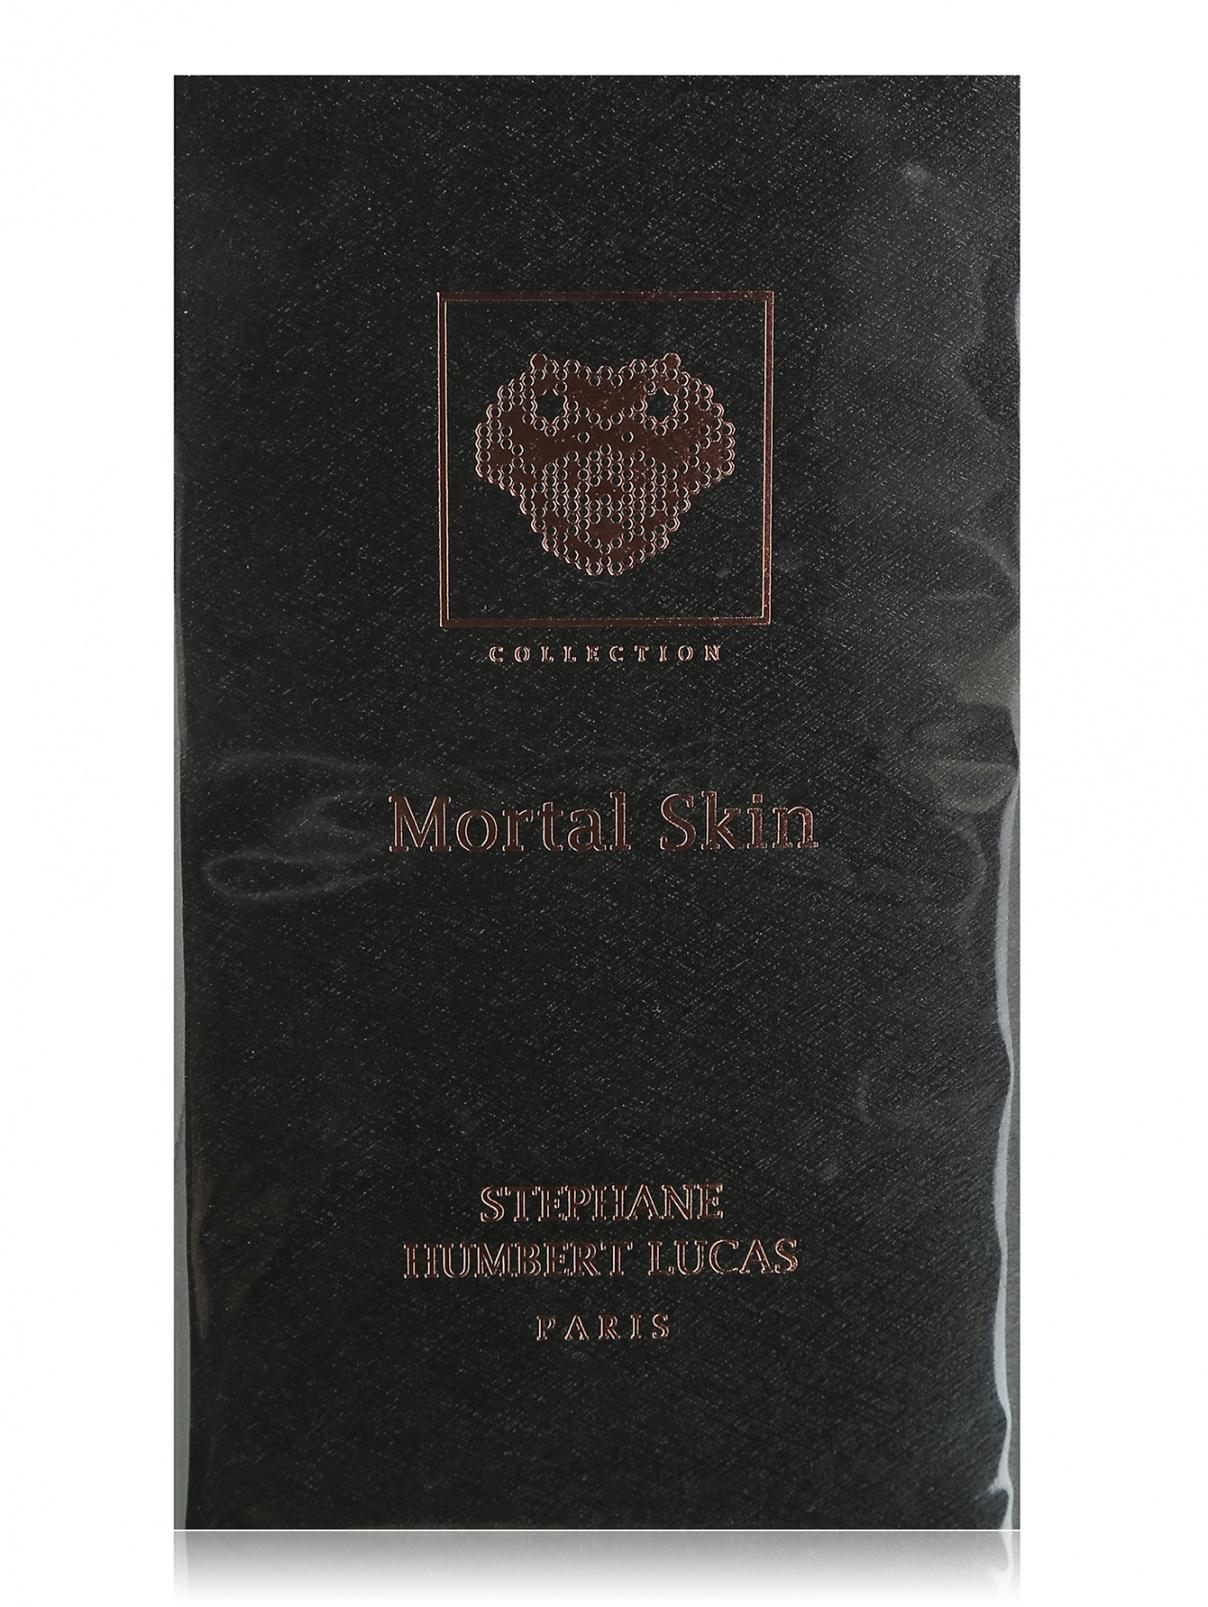 Парфюмерная вода 50 мл Mortal Skin Stephane Humbert Lucas  –  Общий вид